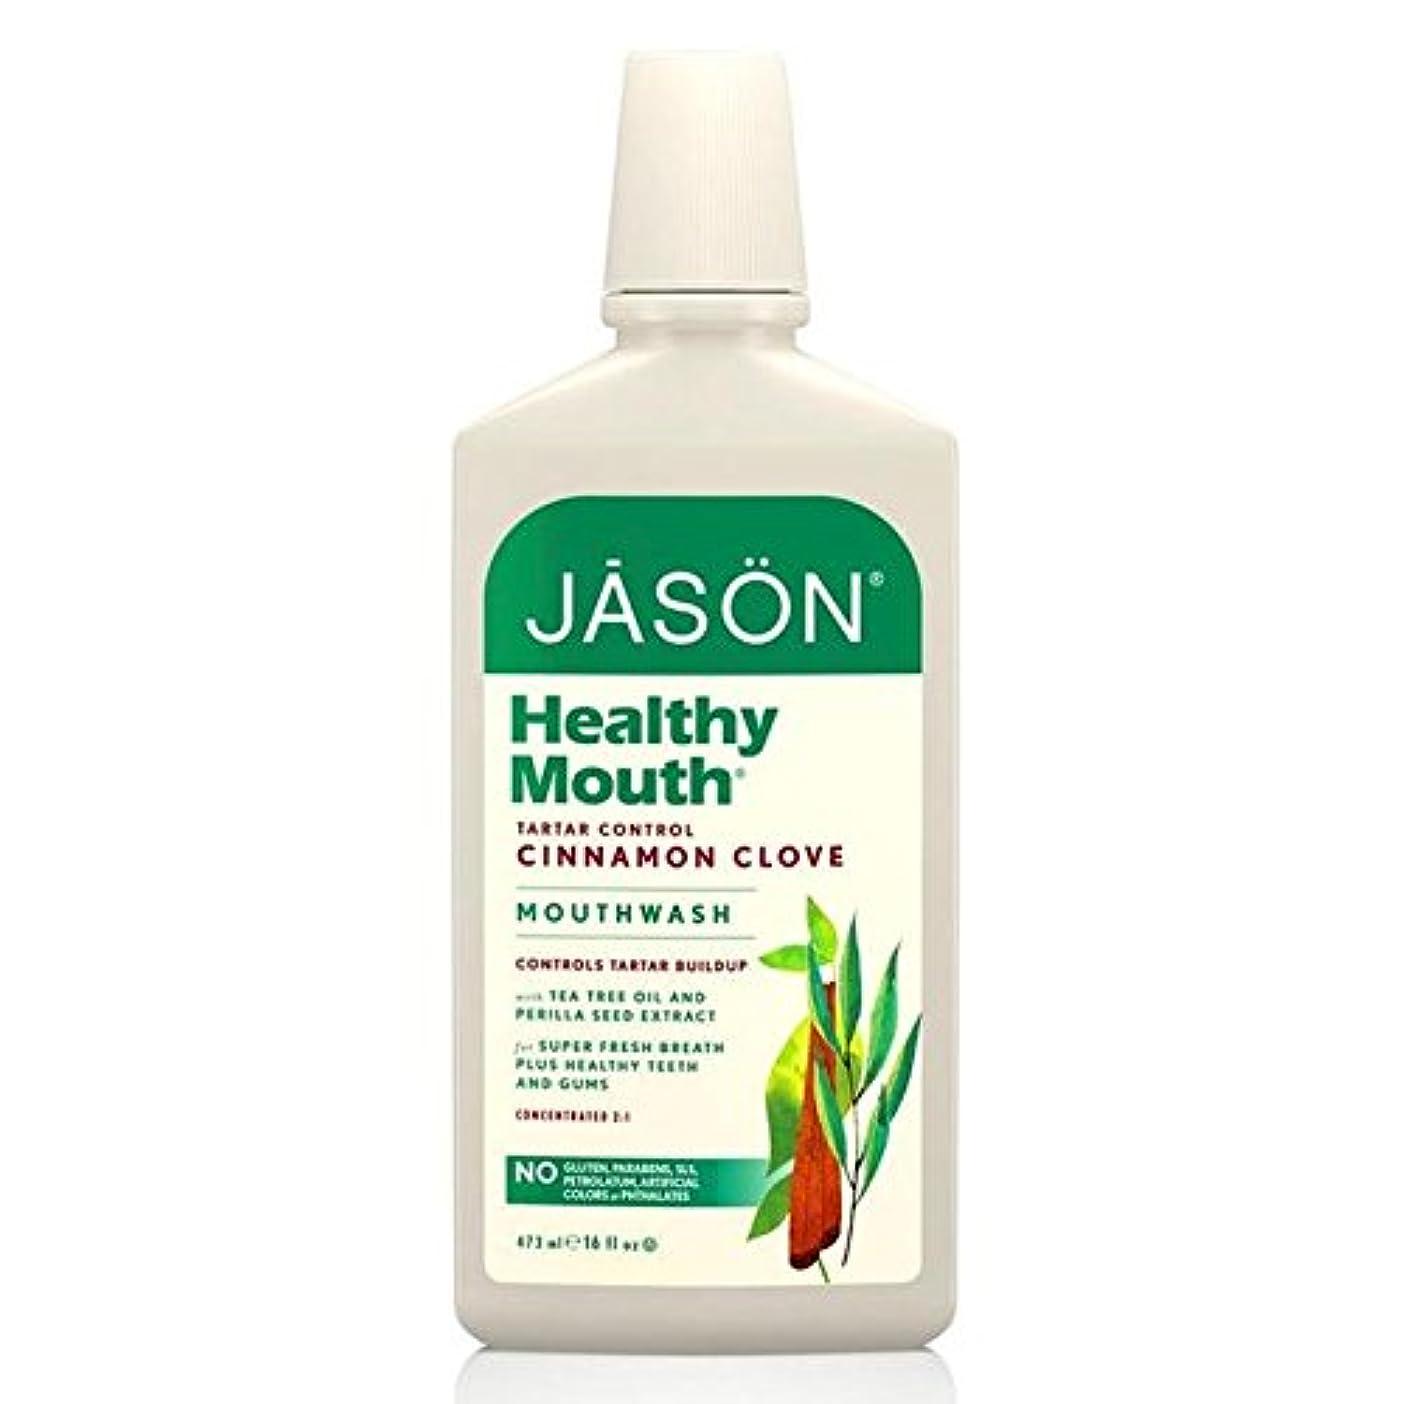 Jason Healthy Mouthwash 480ml (Pack of 6) - ジェイソン?健康マウスウォッシュ480ミリリットル x6 [並行輸入品]